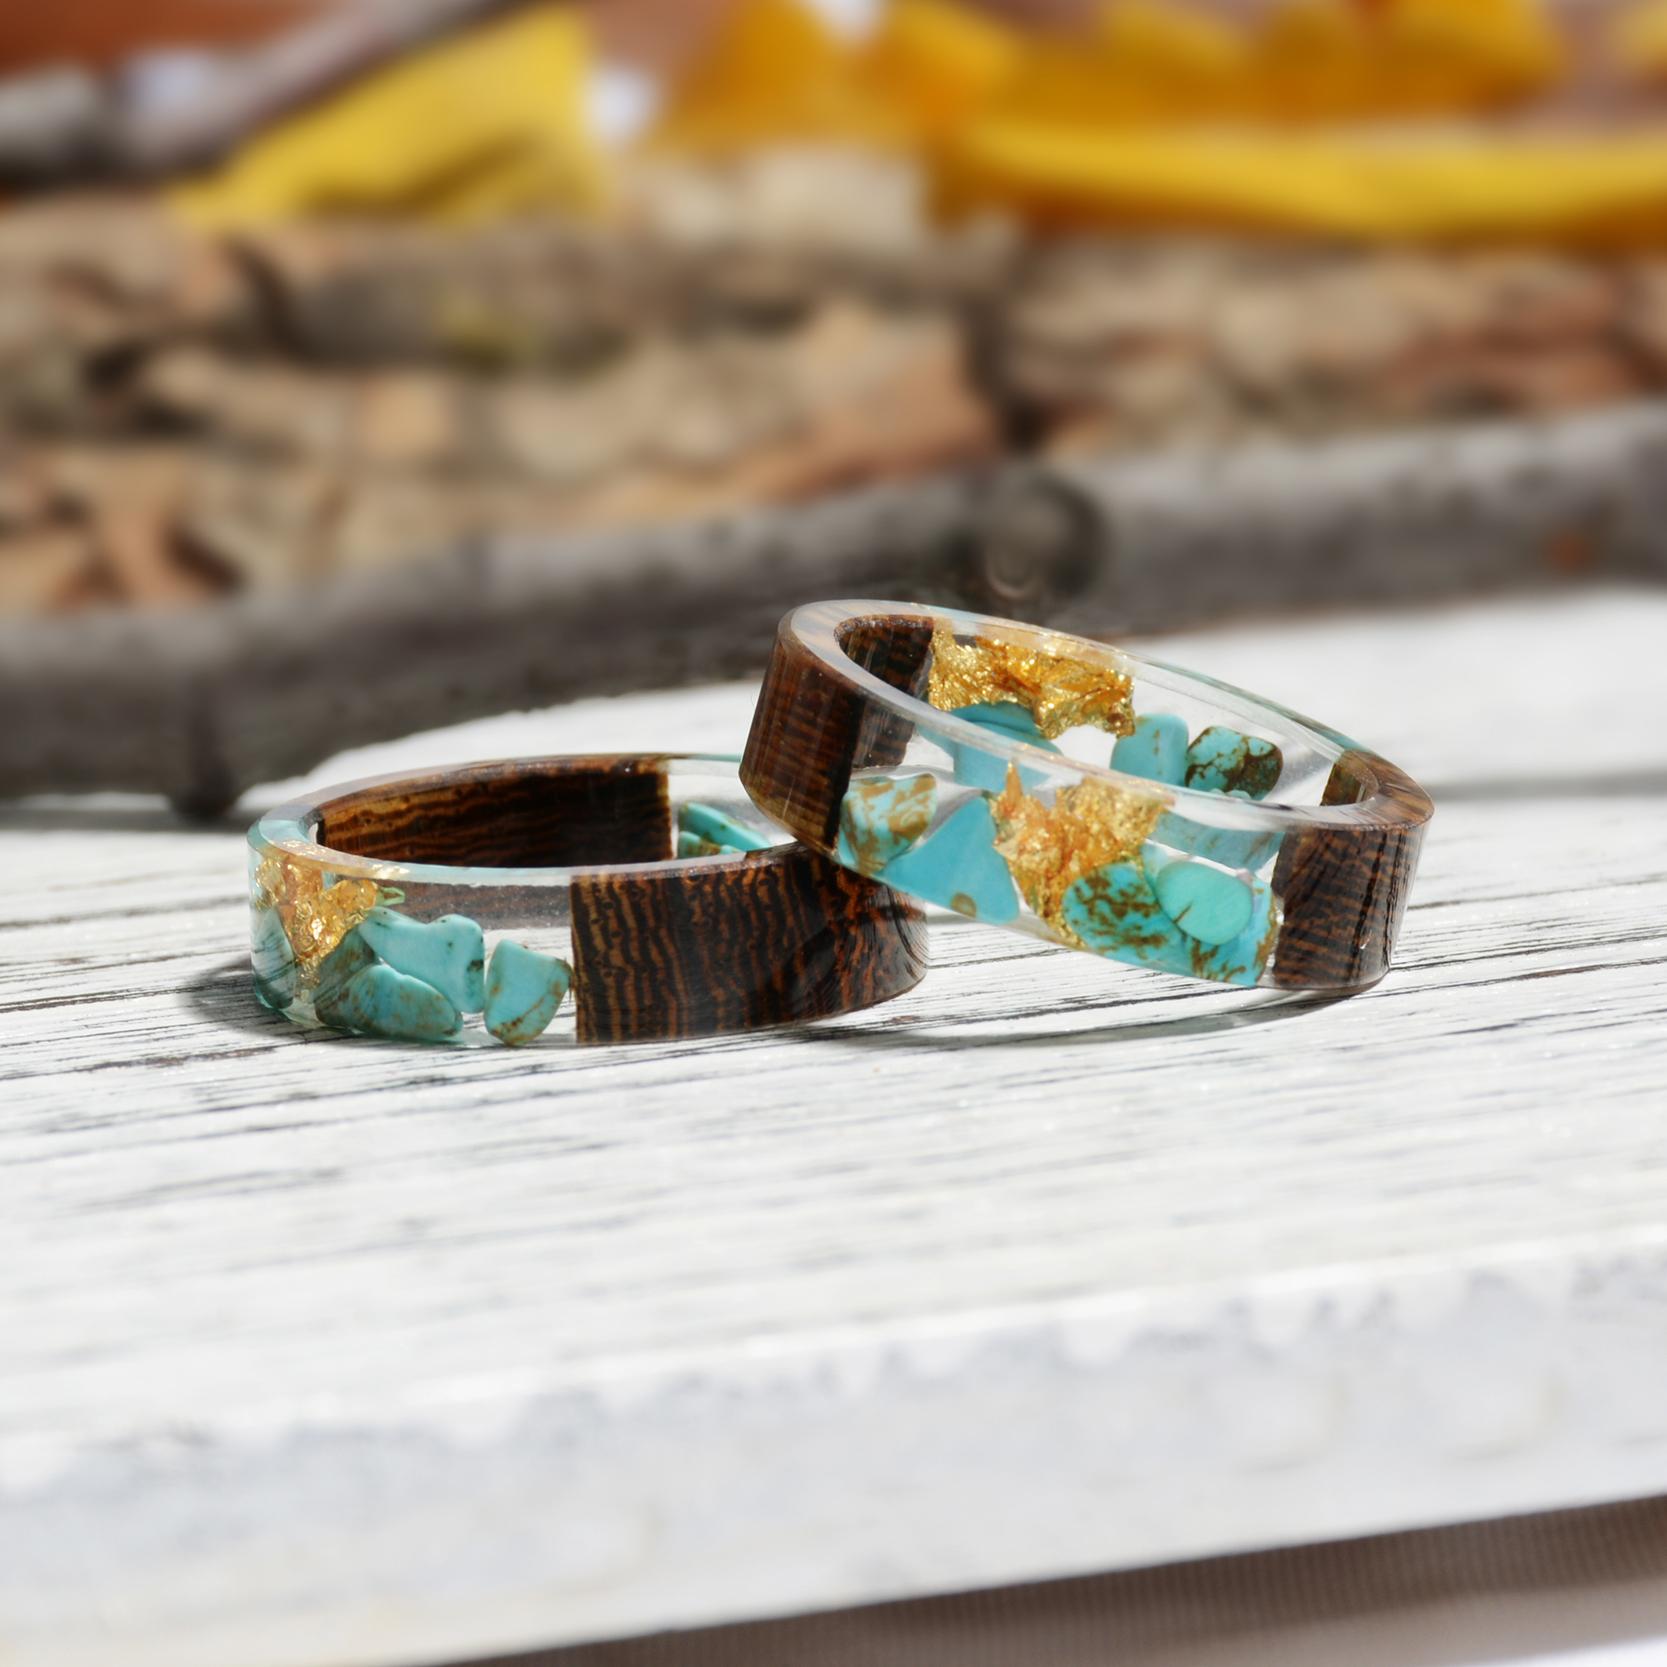 Clear Wood Resin Ring Handmade Dried Flower Hand Jewellery 23